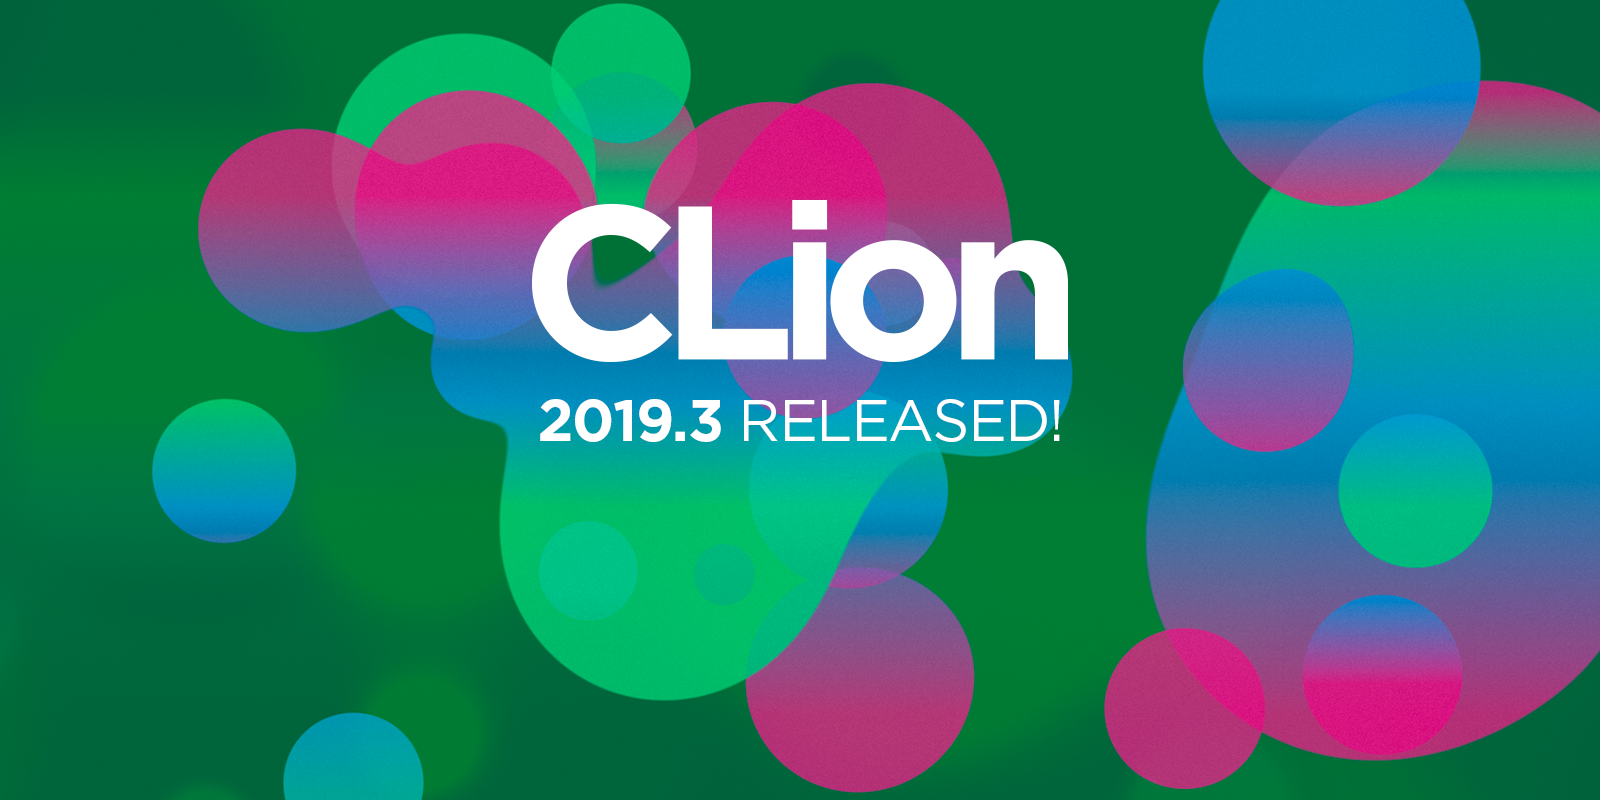 CLion release